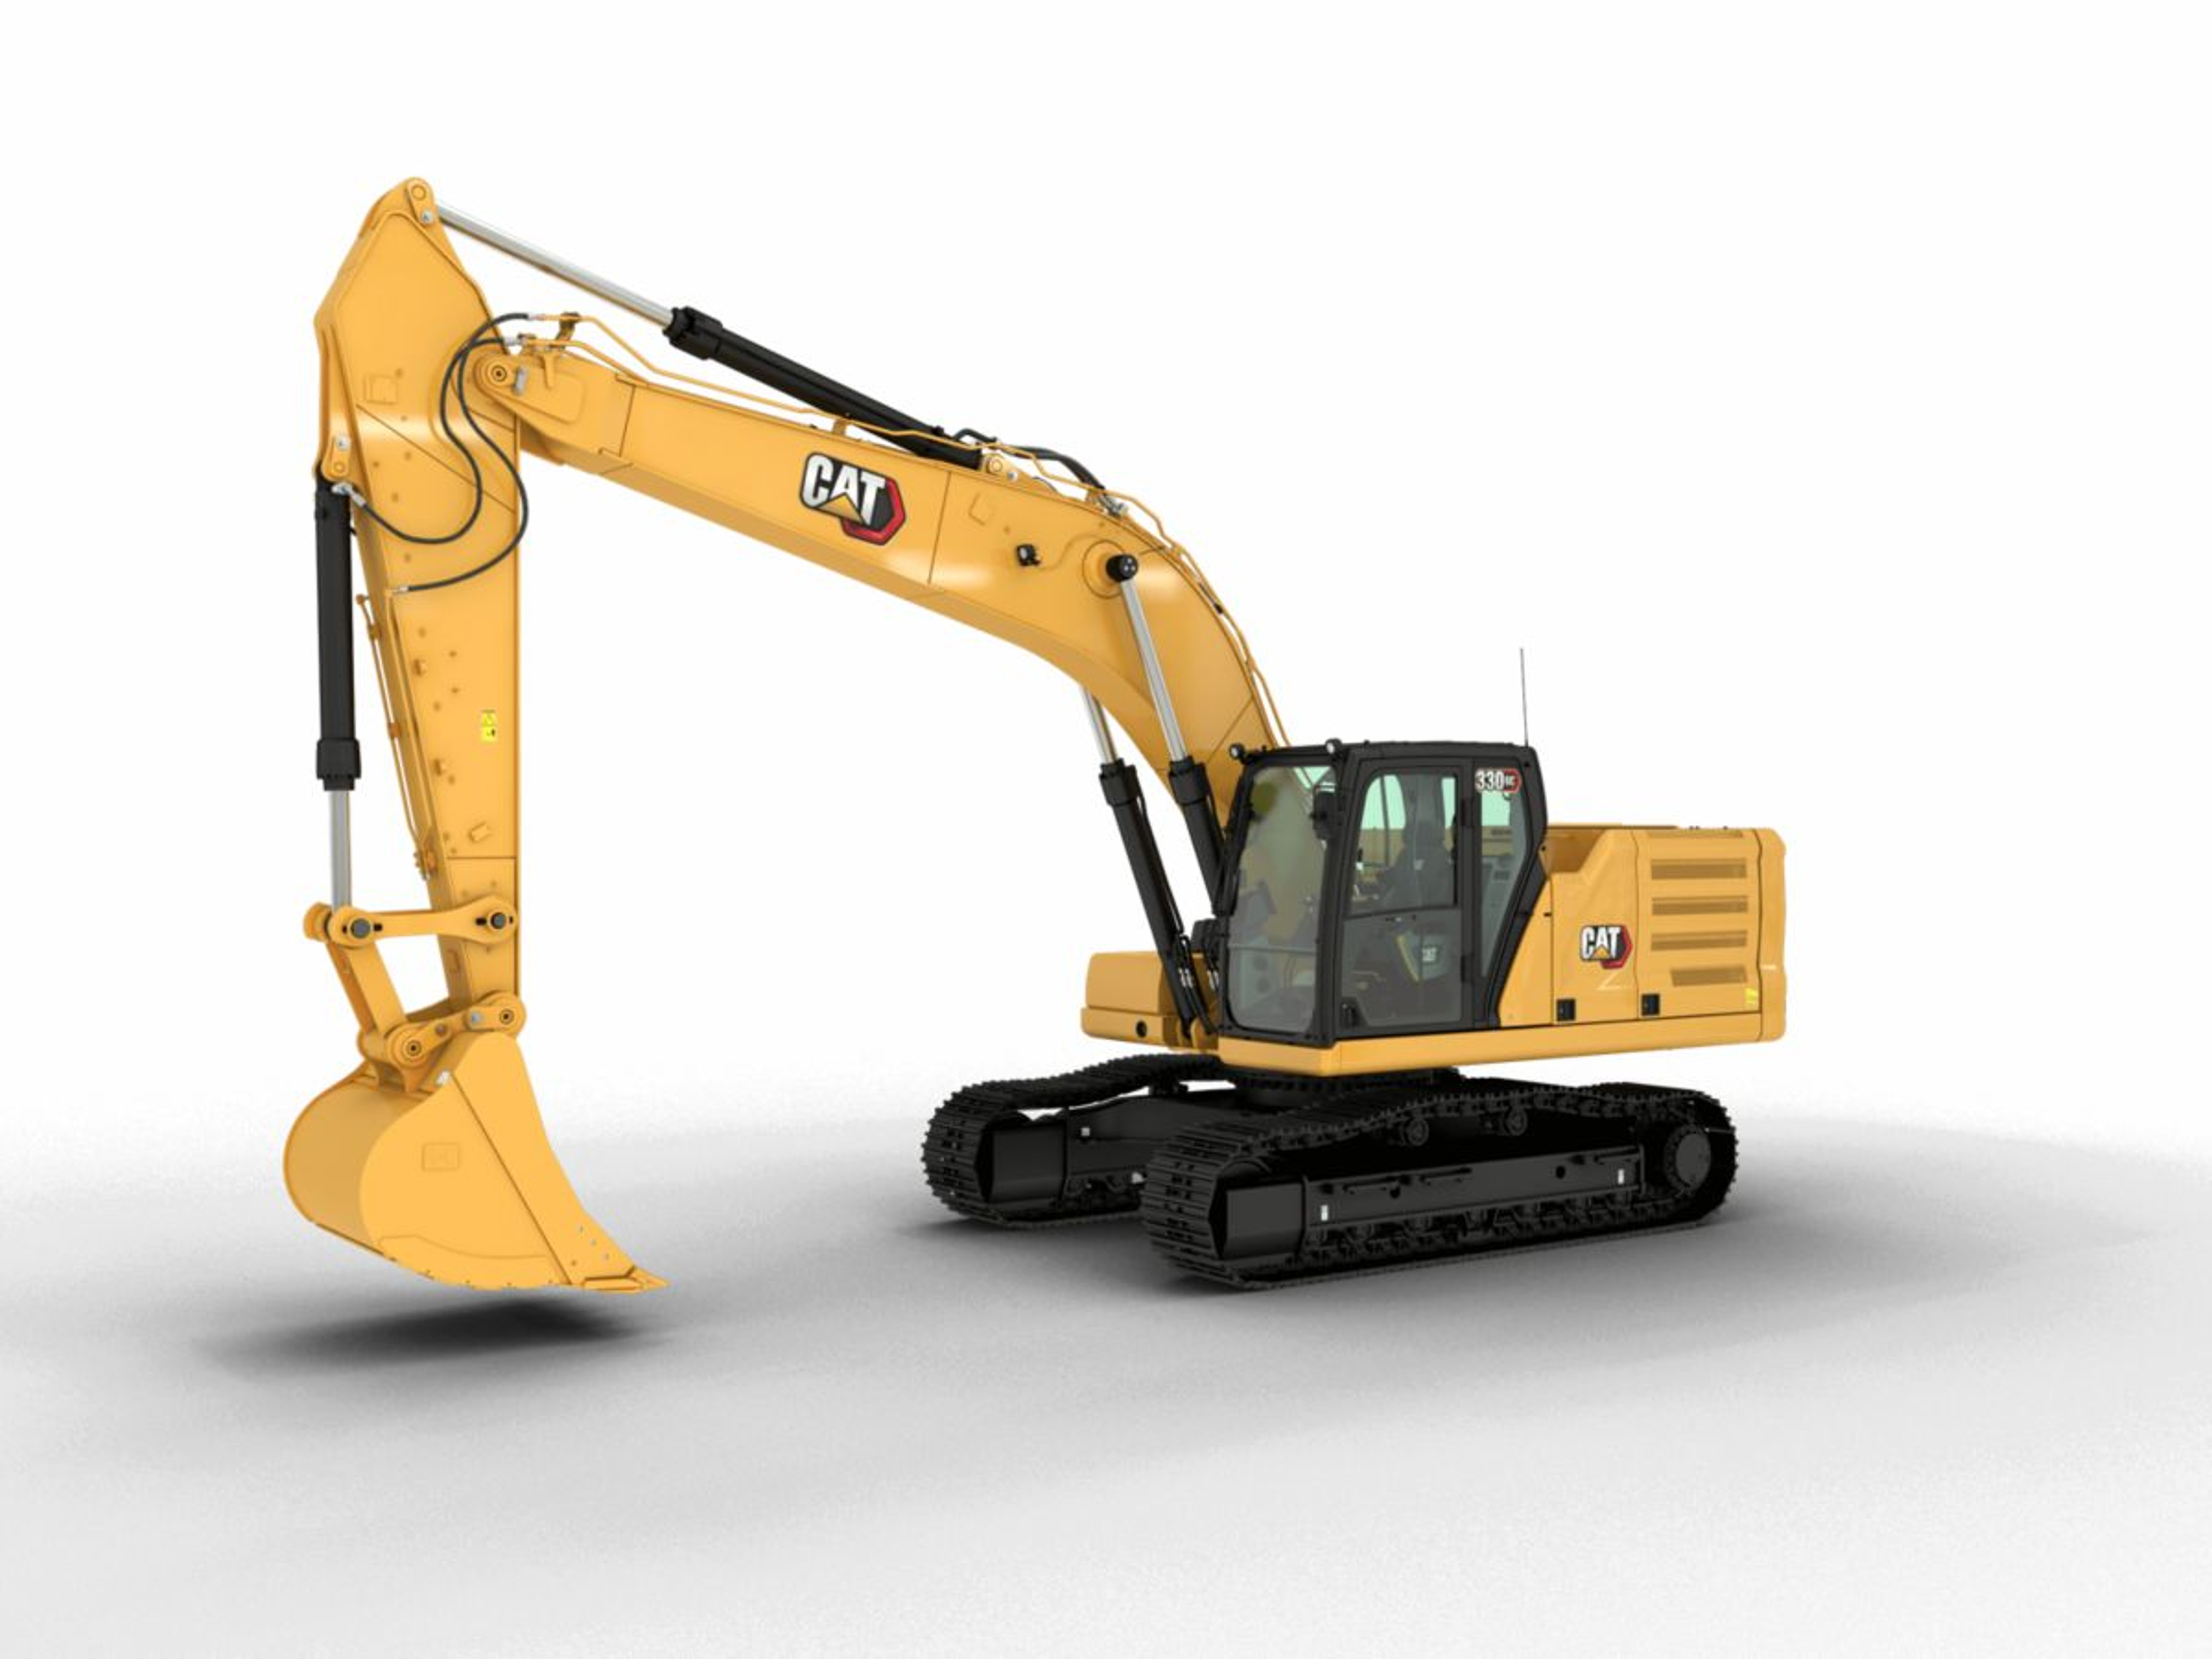 330 GC Excavator | 30 Ton Excavator / Digger